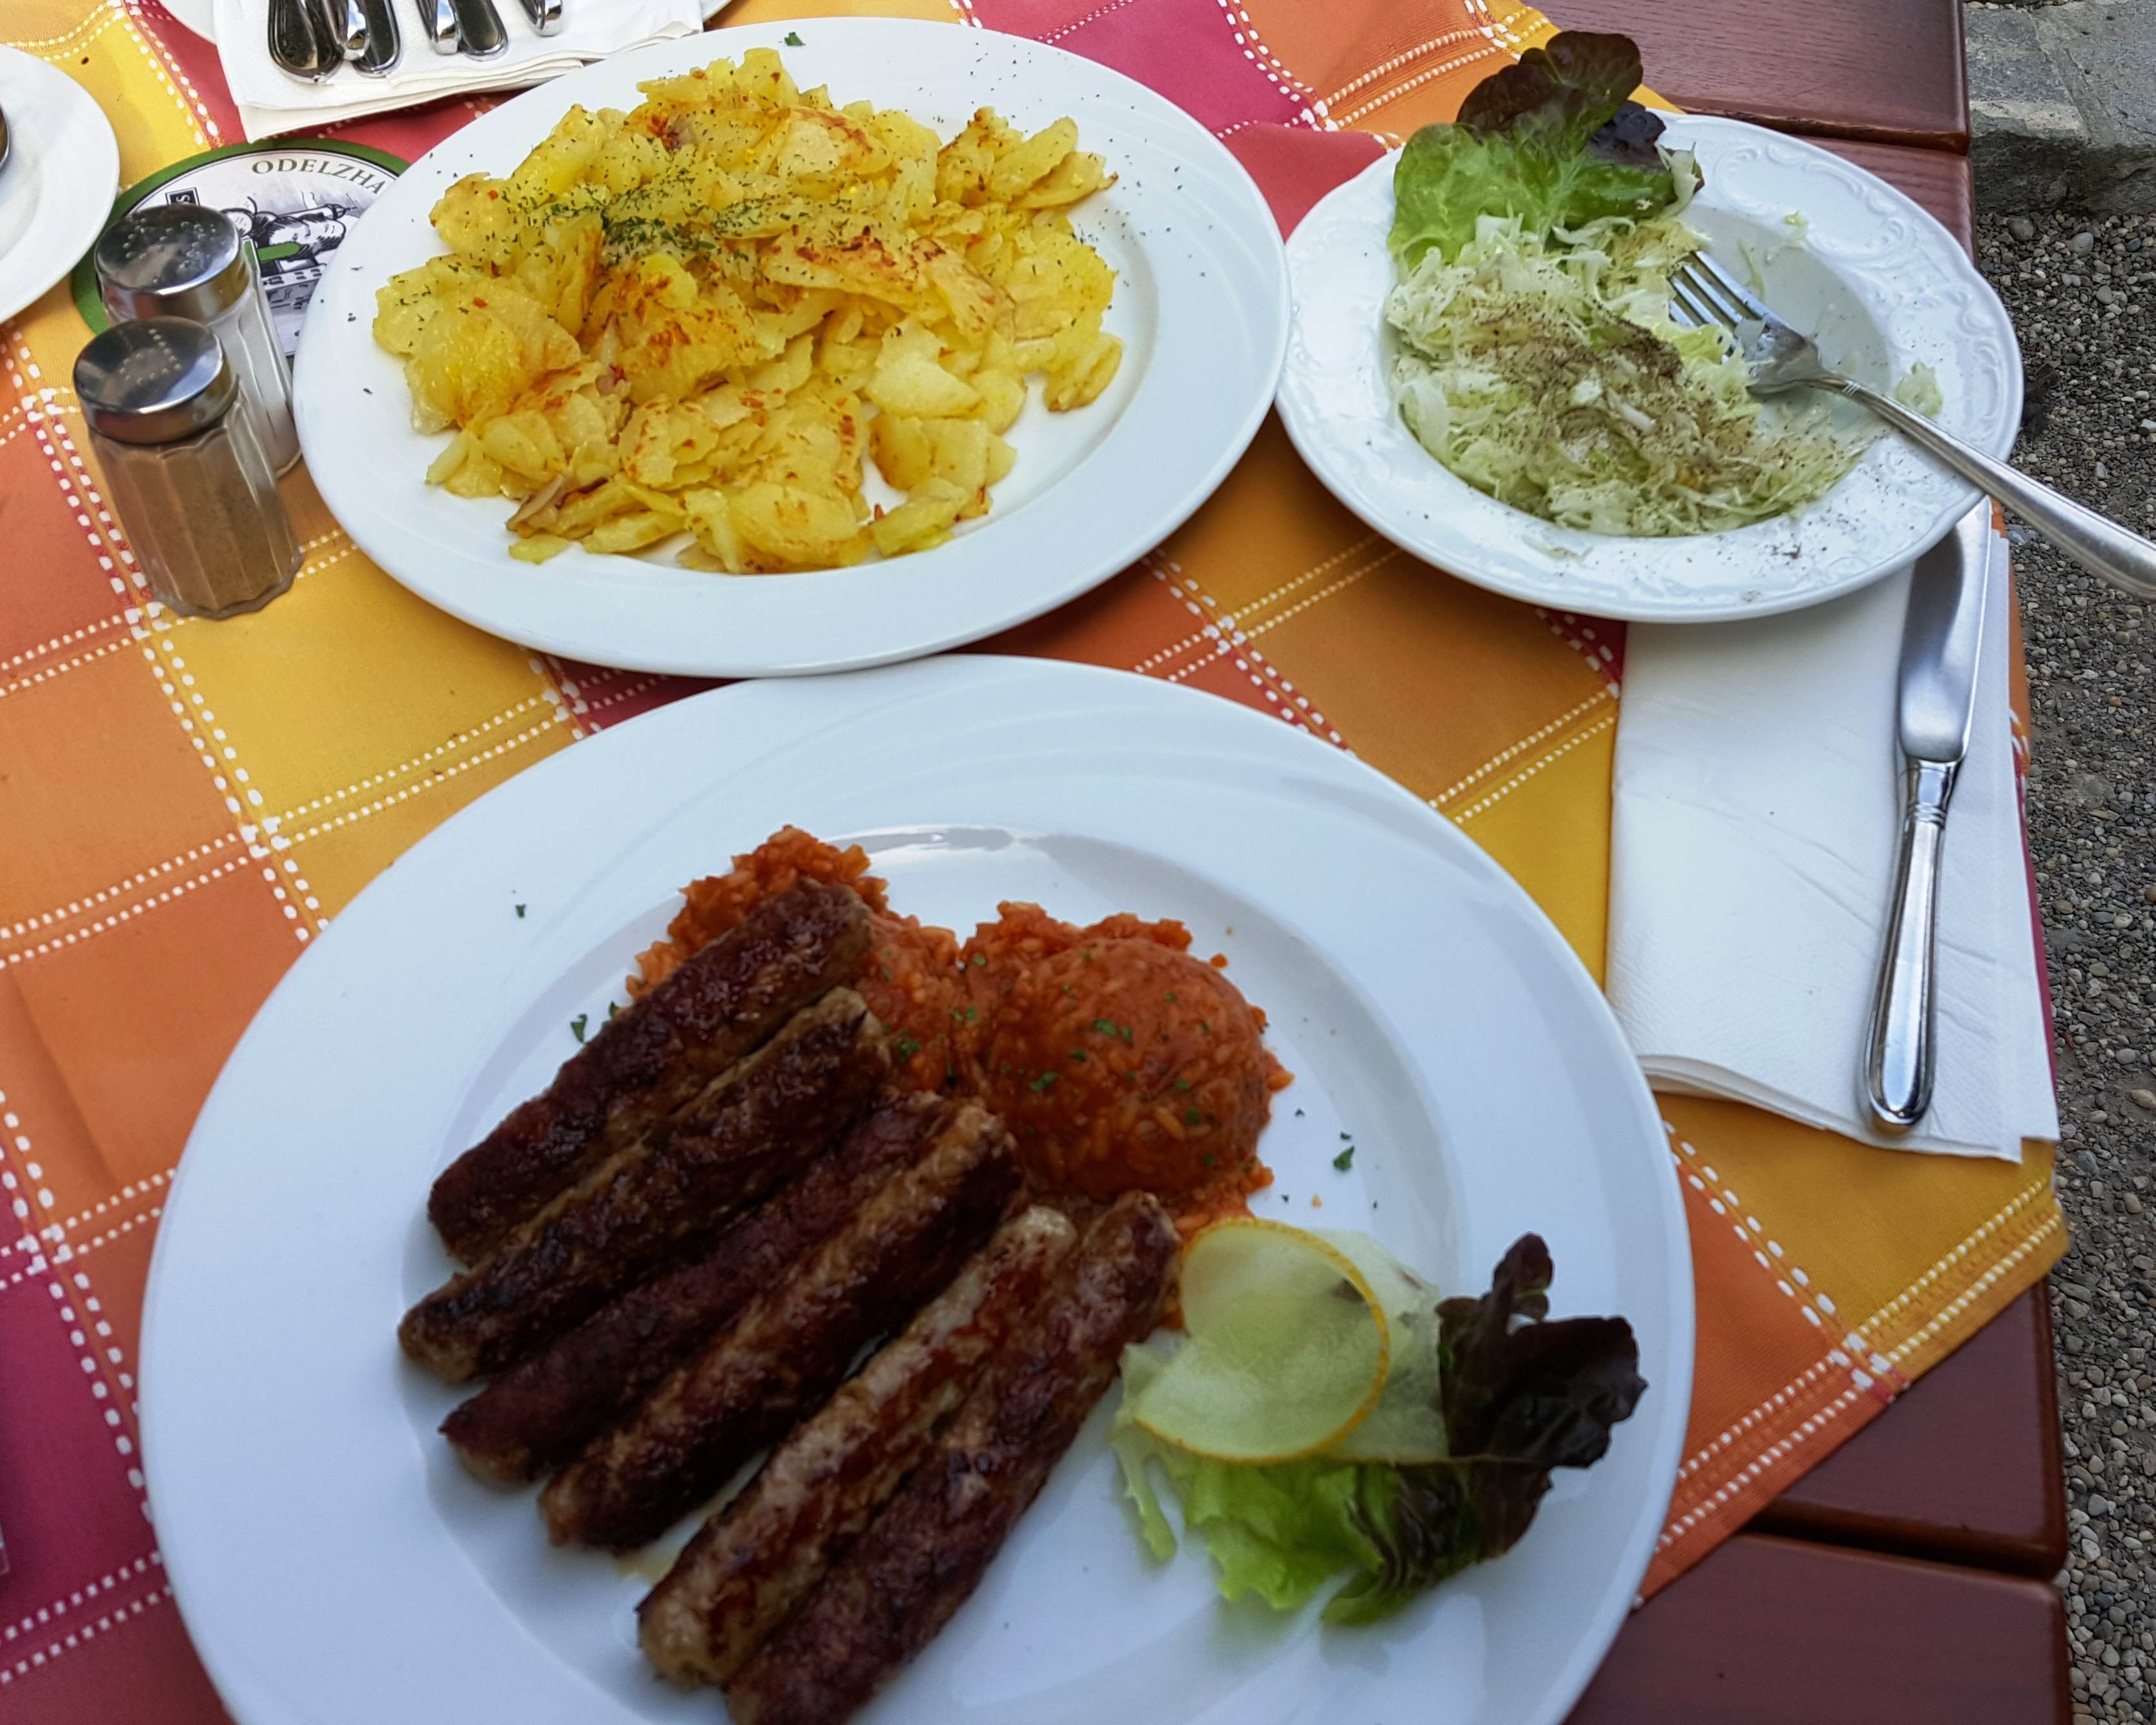 Die Post in Eurasburg: Die besten Ćevapčići die ich kenne